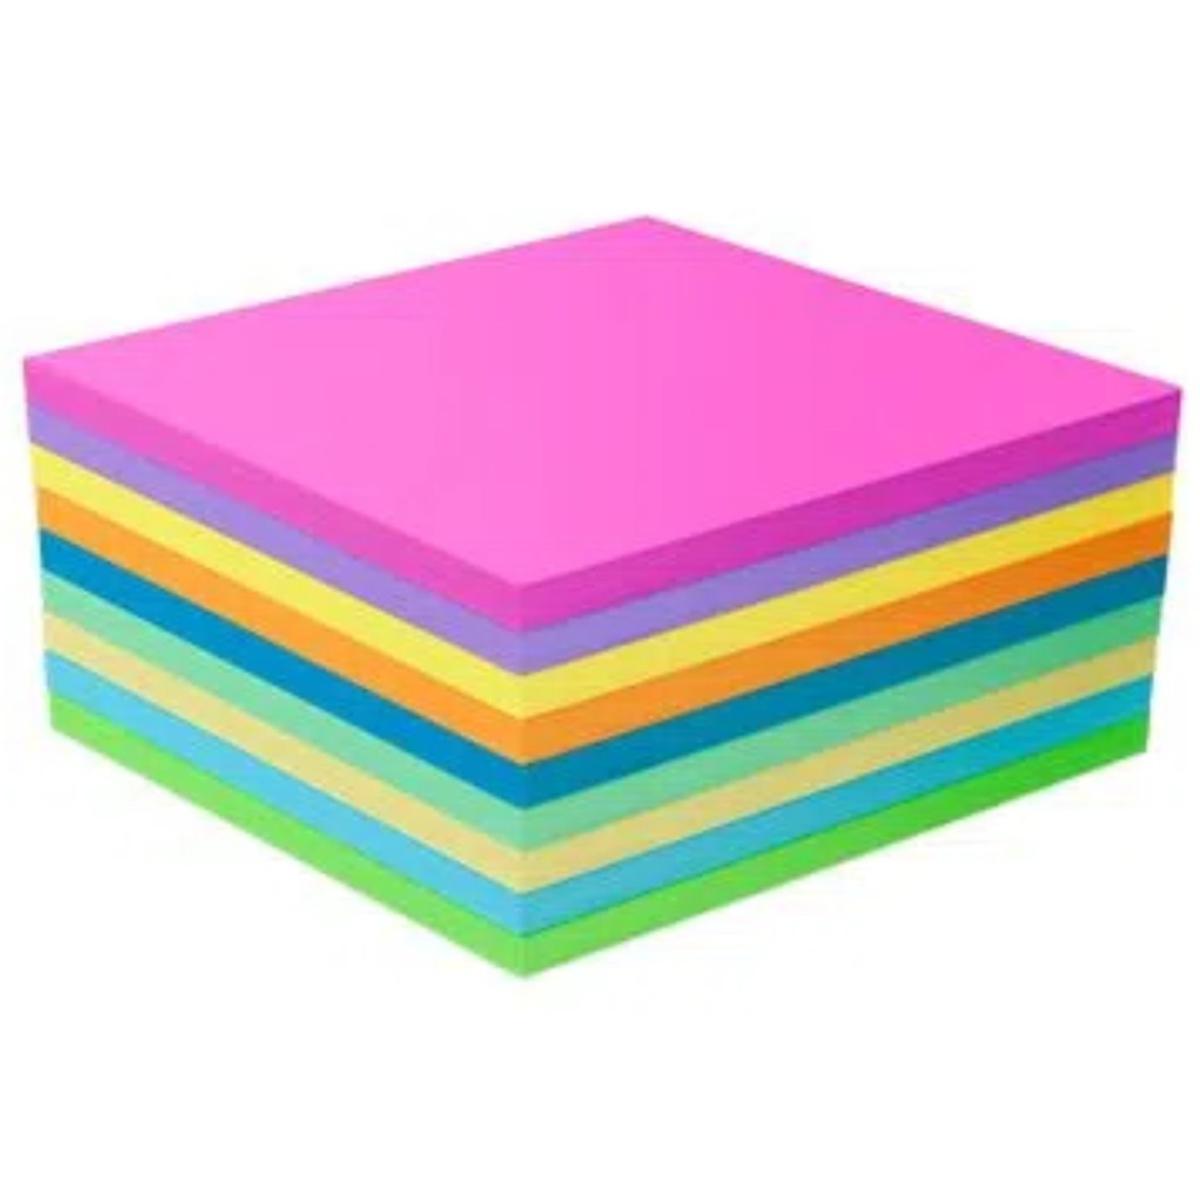 Bloco Notas Adesivas Keep 9 Cores Magic 75x75mm C/225 Folhas